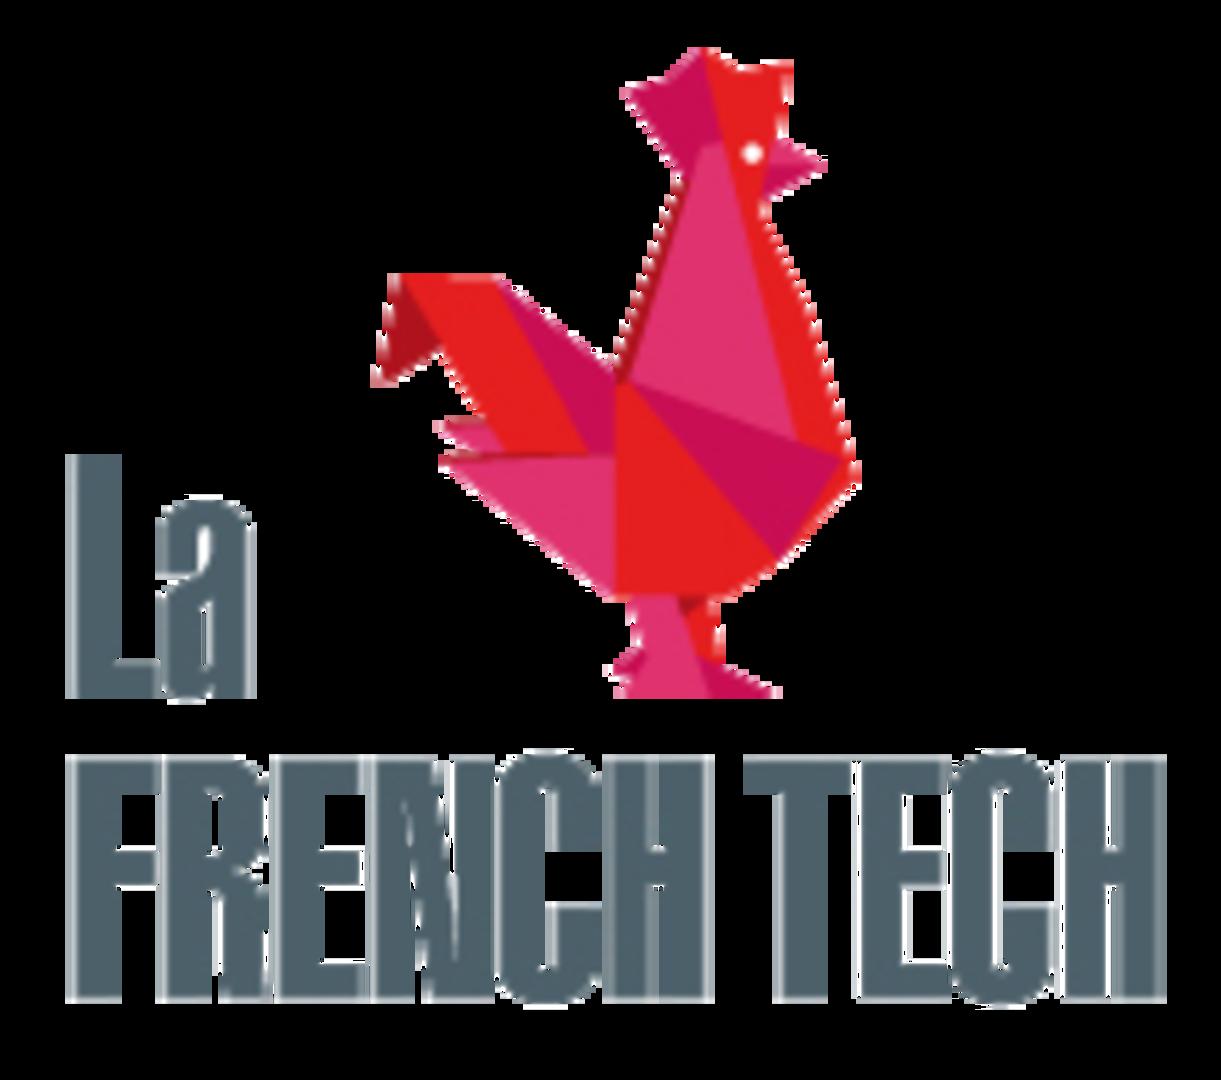 Frenchtech rmkbuh